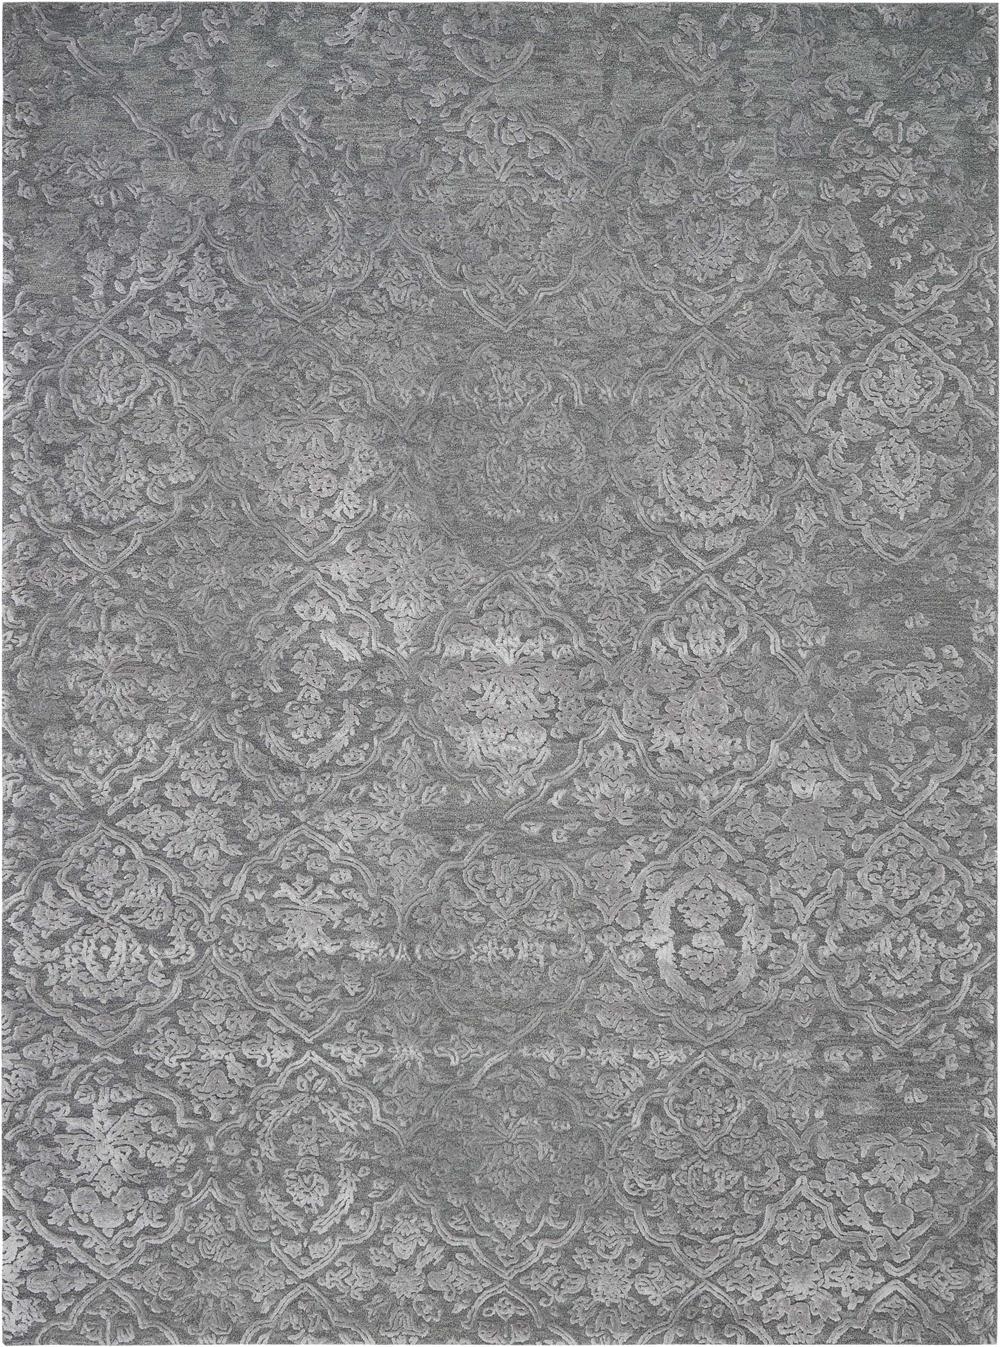 Nourison OPALINE OPA14 CHARCOAL/SILVER Rug